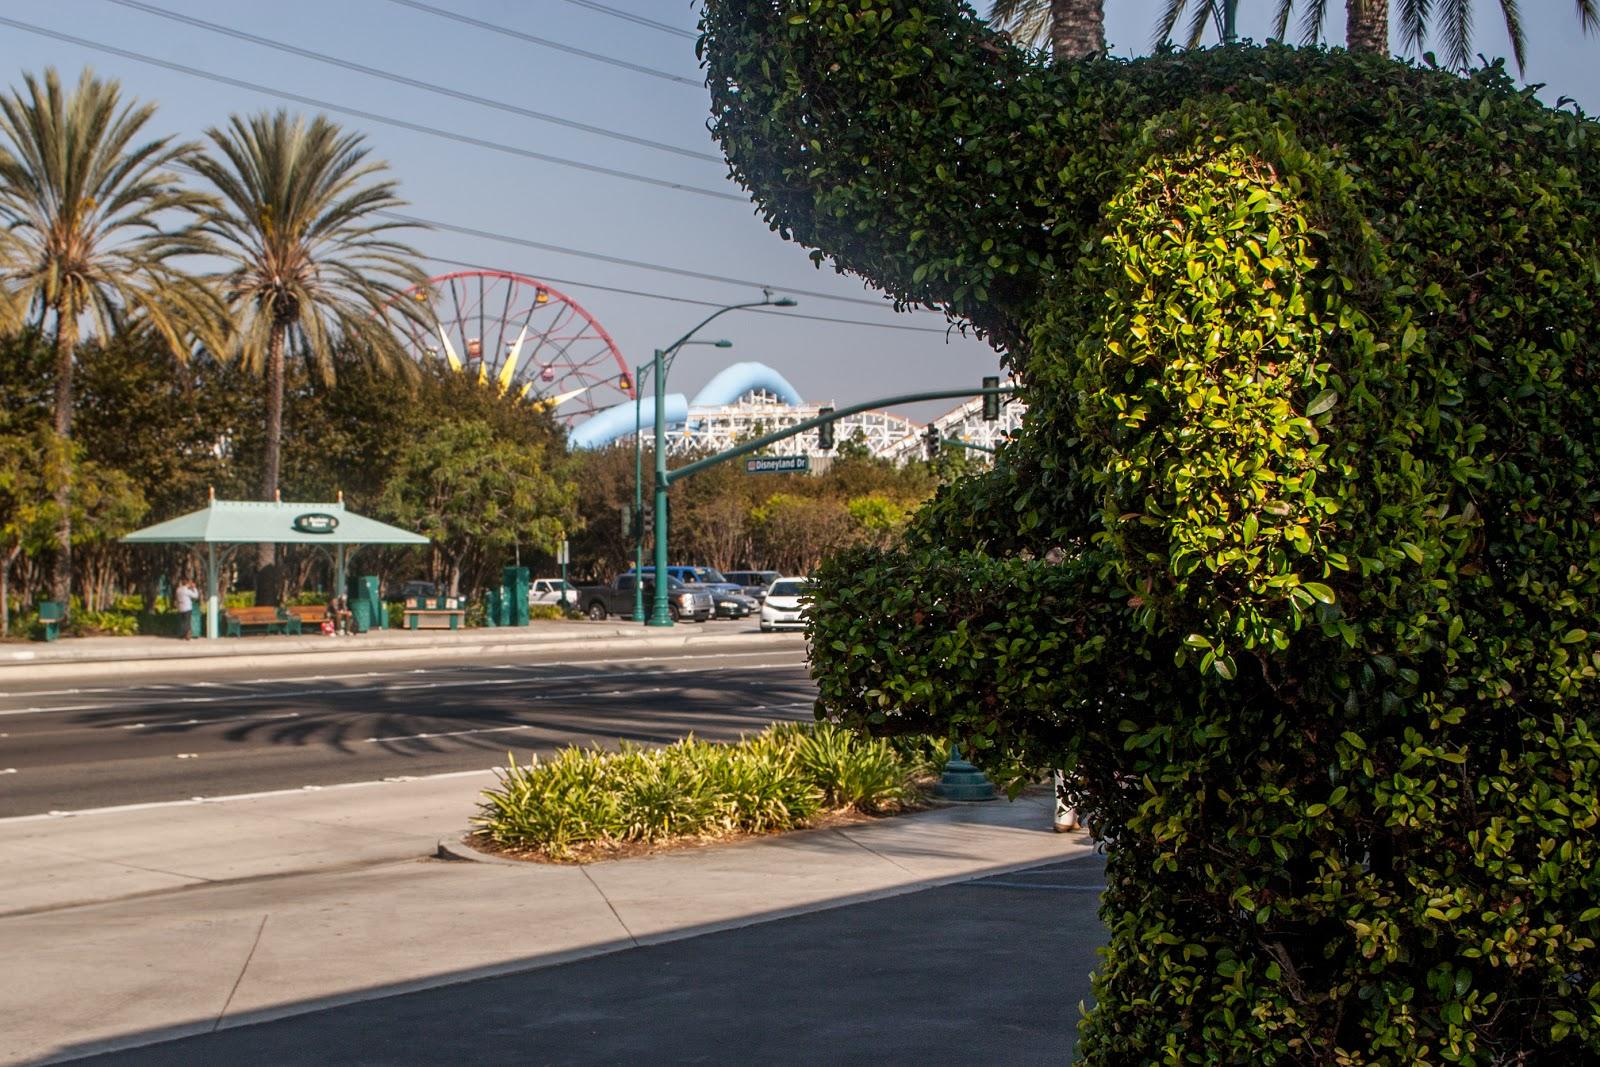 BEST WESTERN PLUS Stovall's Inn - Disneyland Hotel